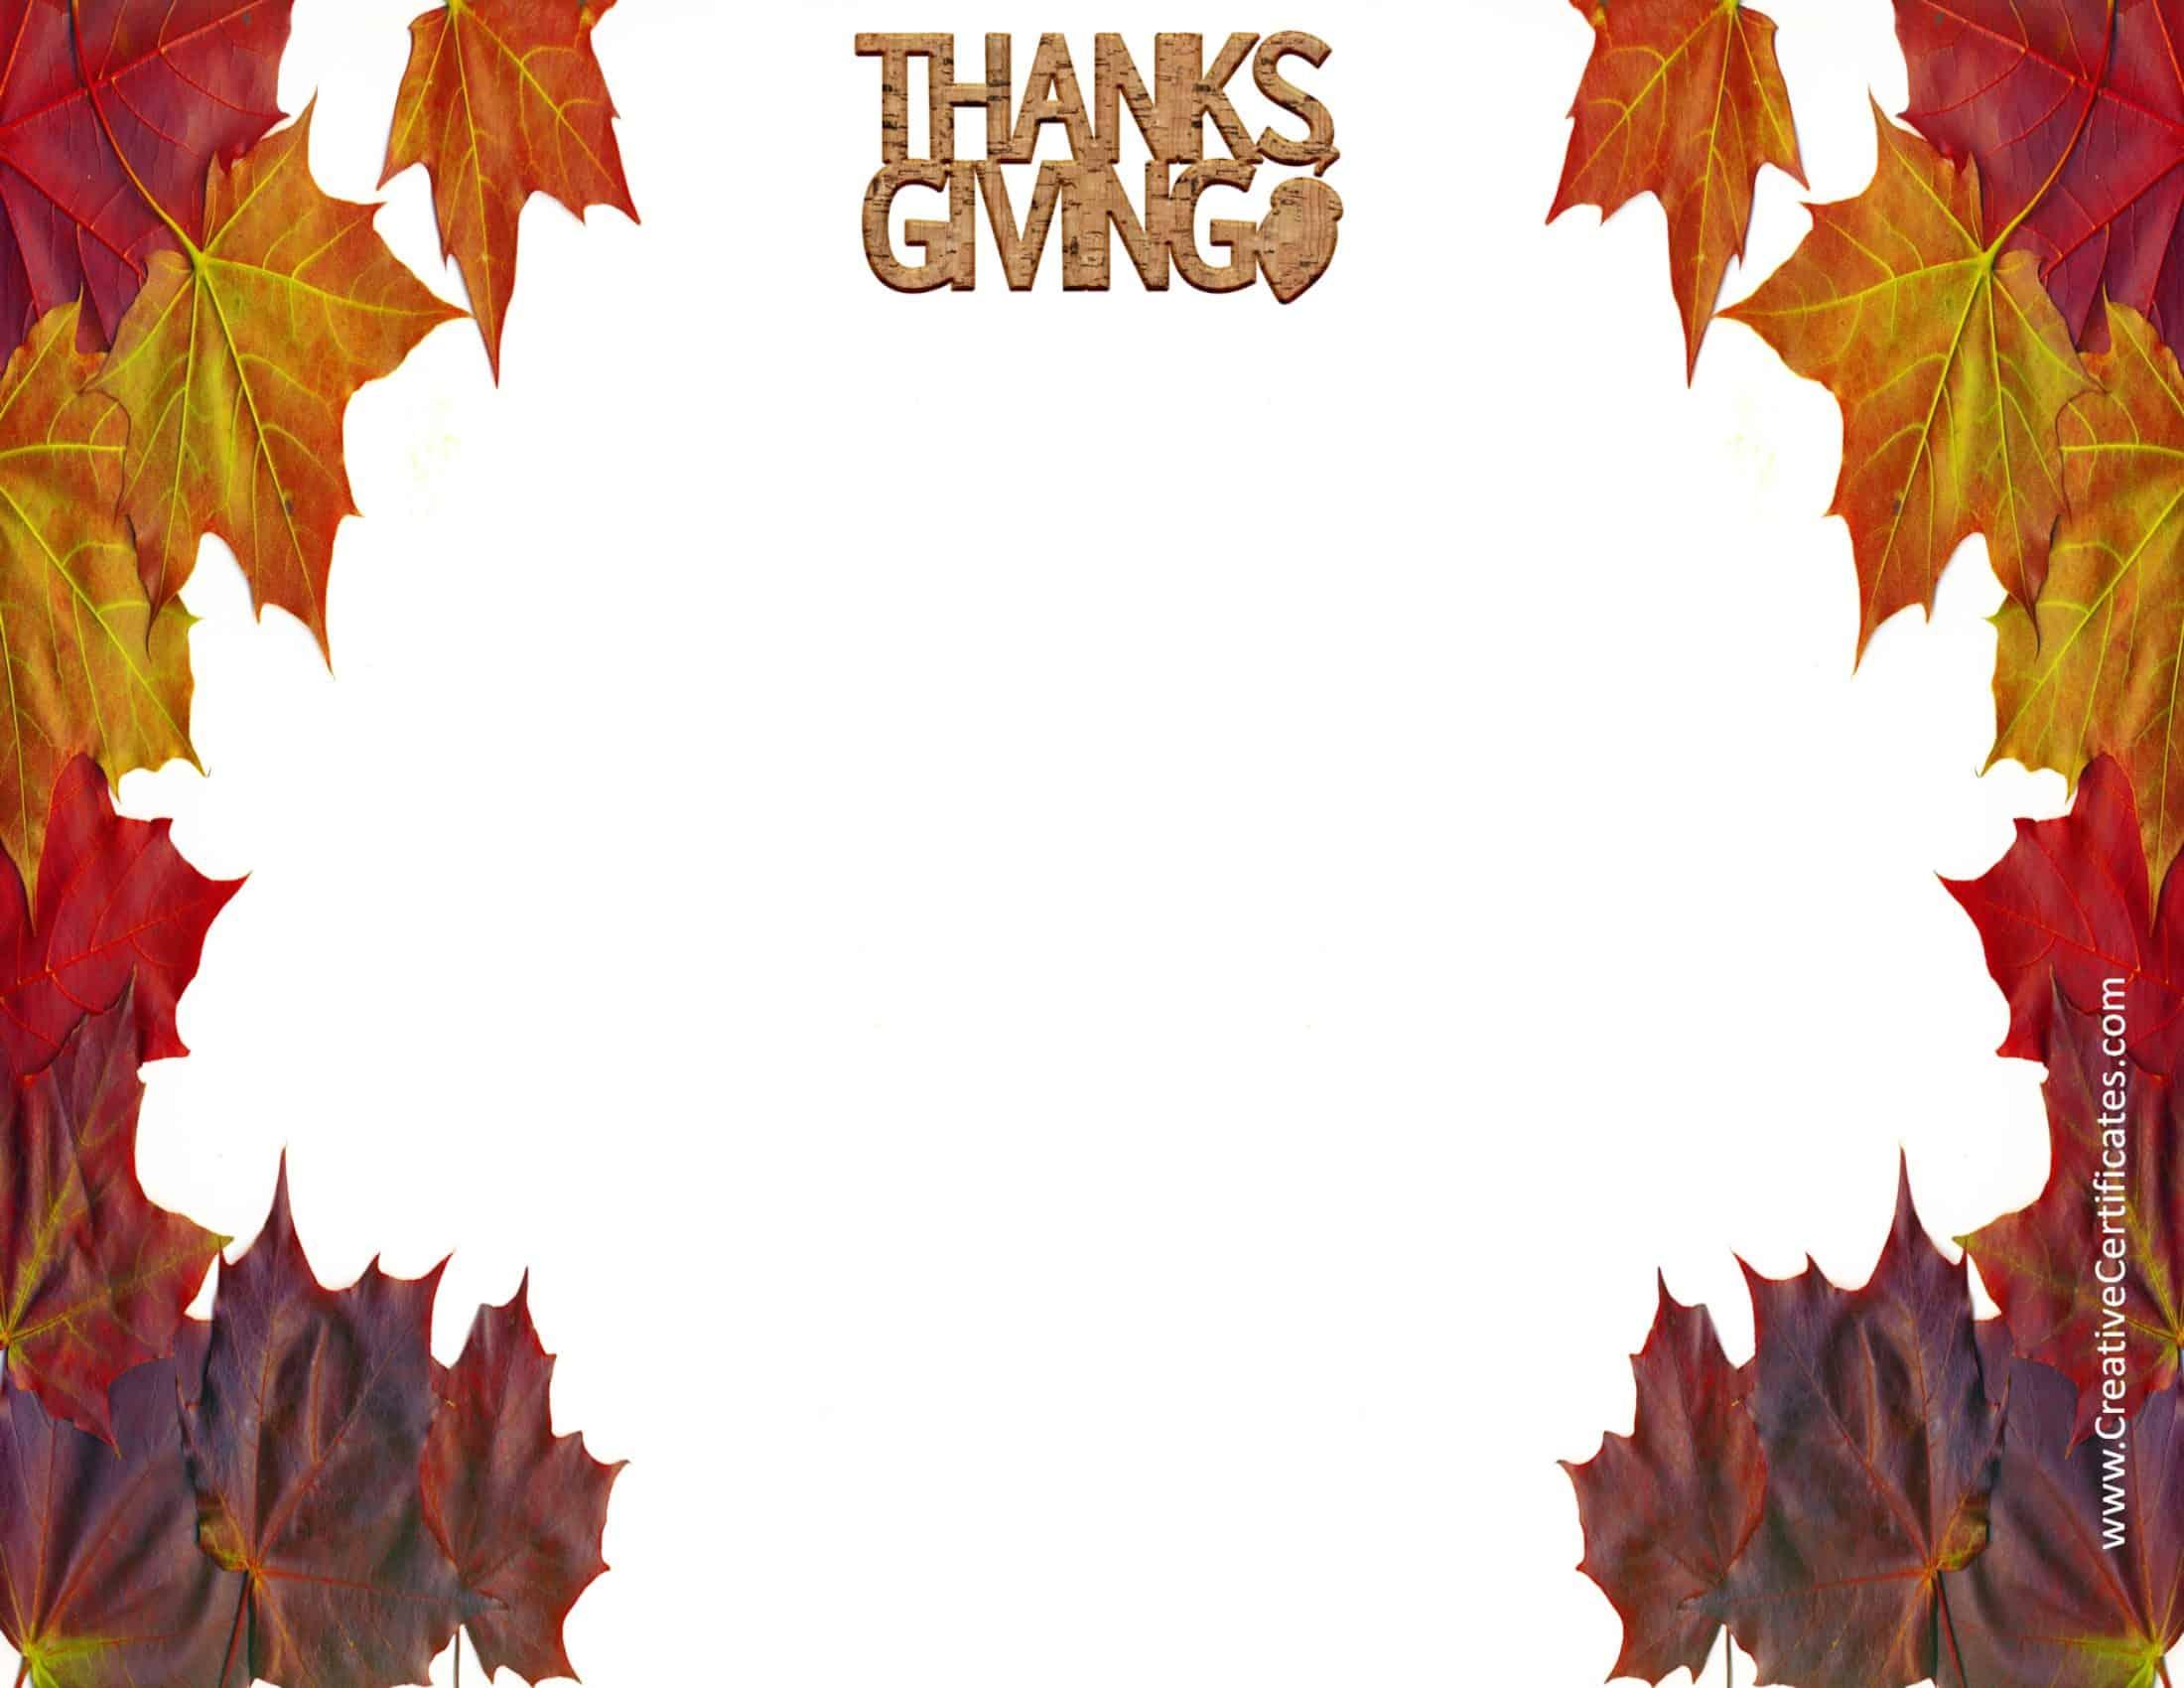 Thanksgiving borders